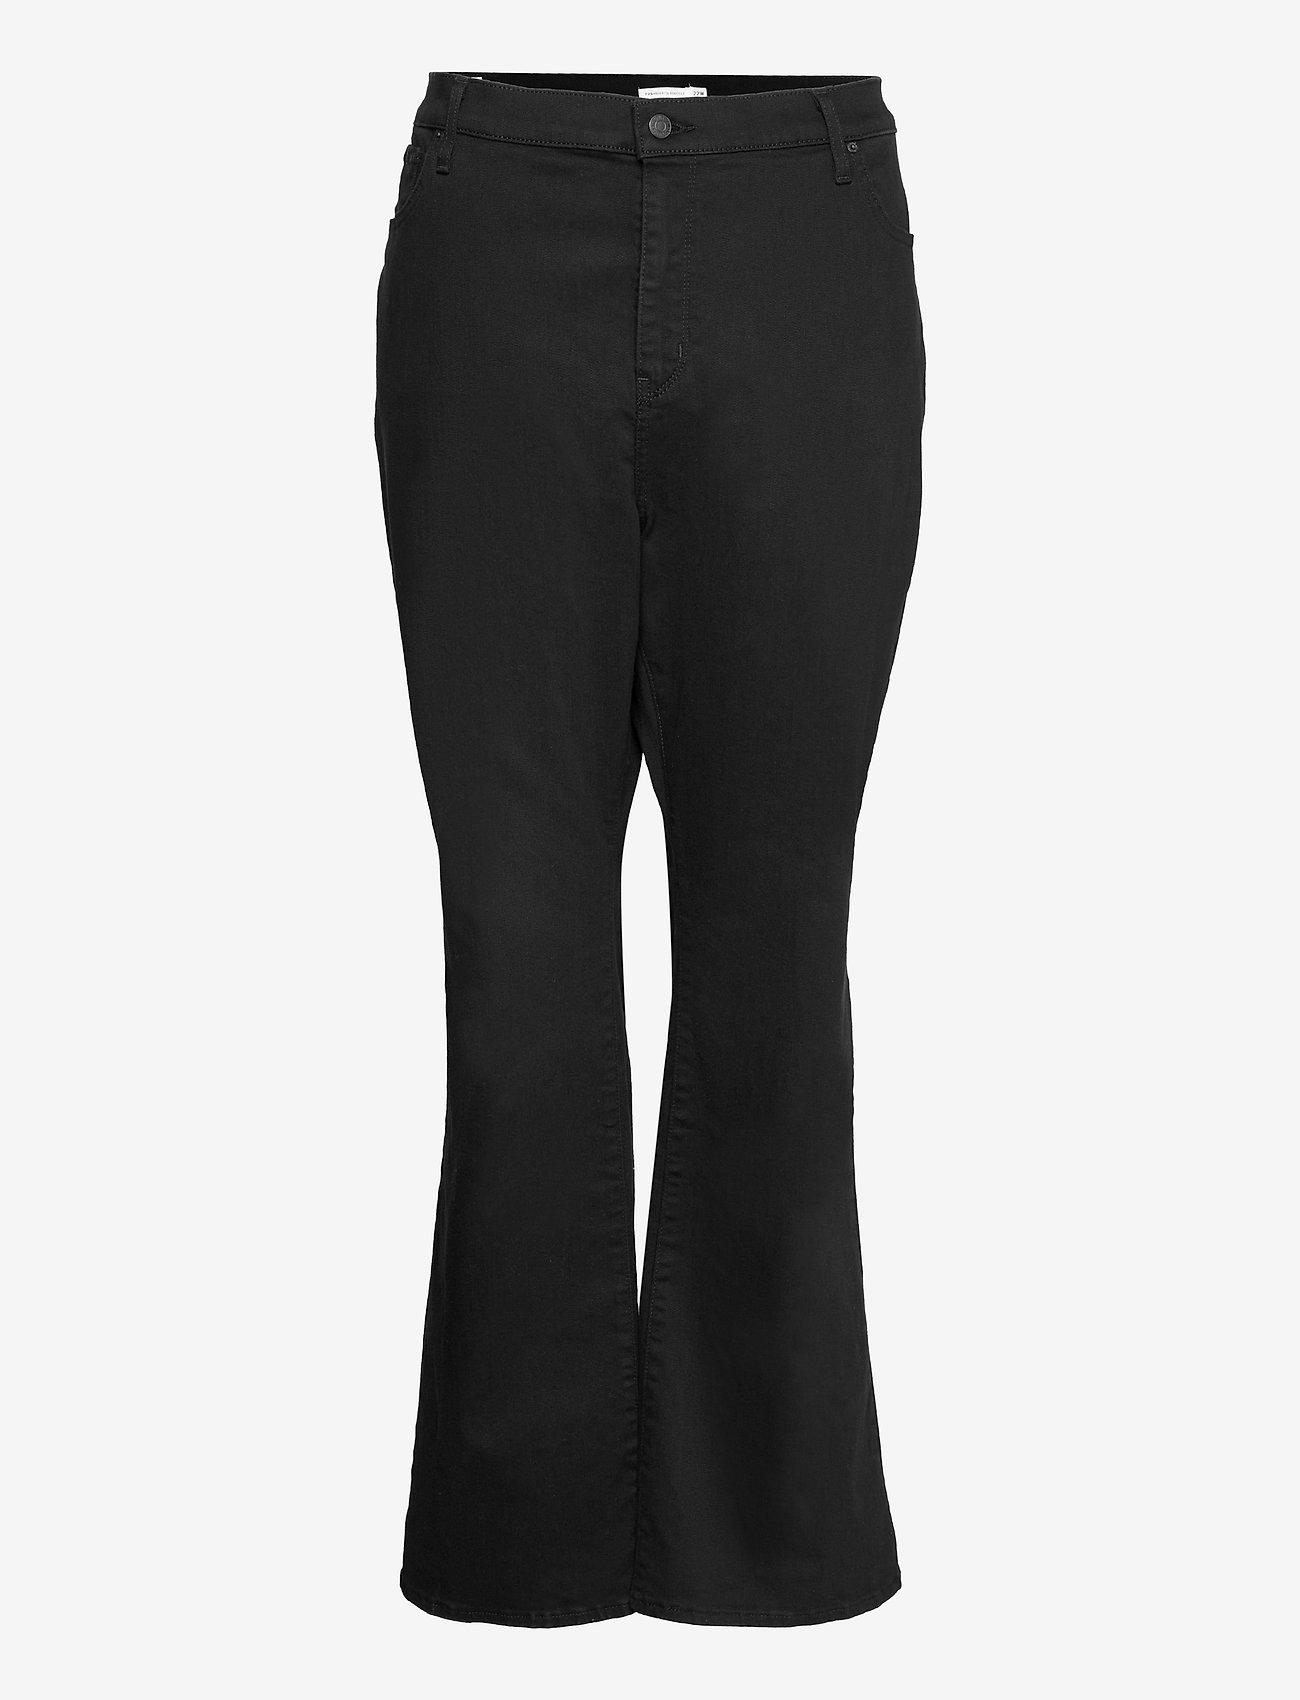 Levi's Plus Size - 725 PL HR BOOTCUT NIGHT IS BLA - bootcut jeans - blacks - 0